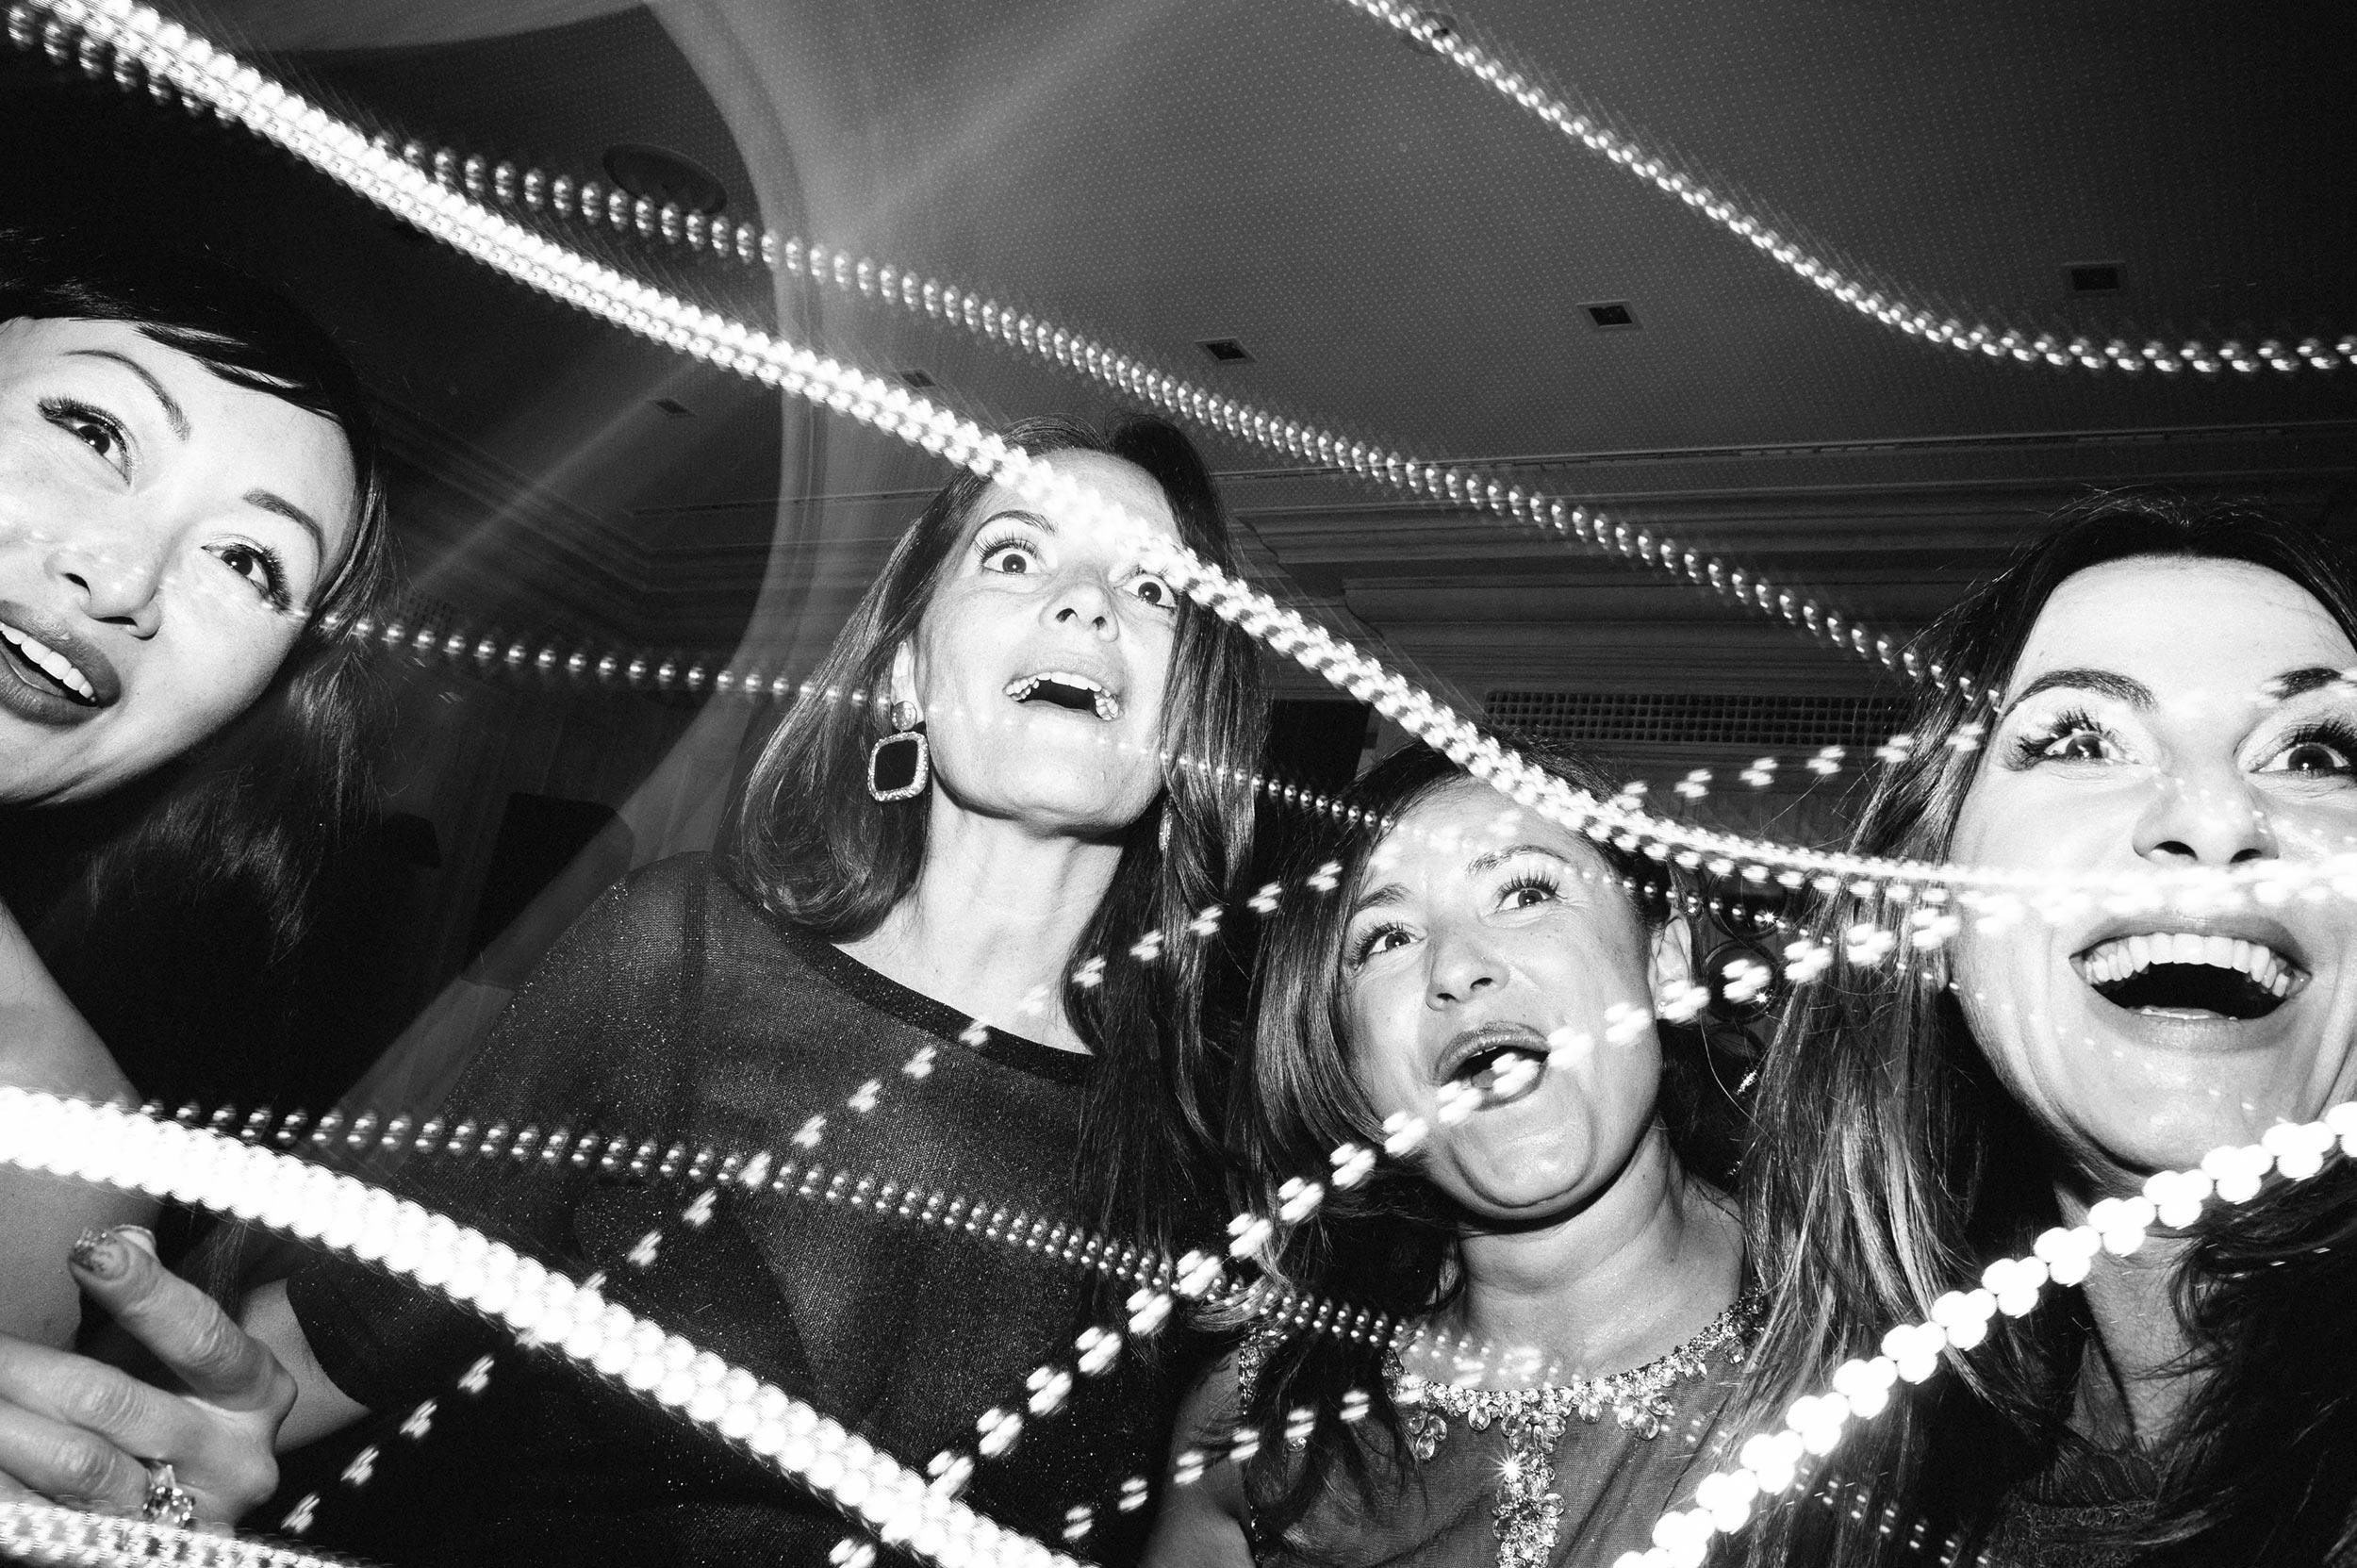 astonished-women-among-lights-during-wedding-reception-black-and-white-wedding-photography.jpg